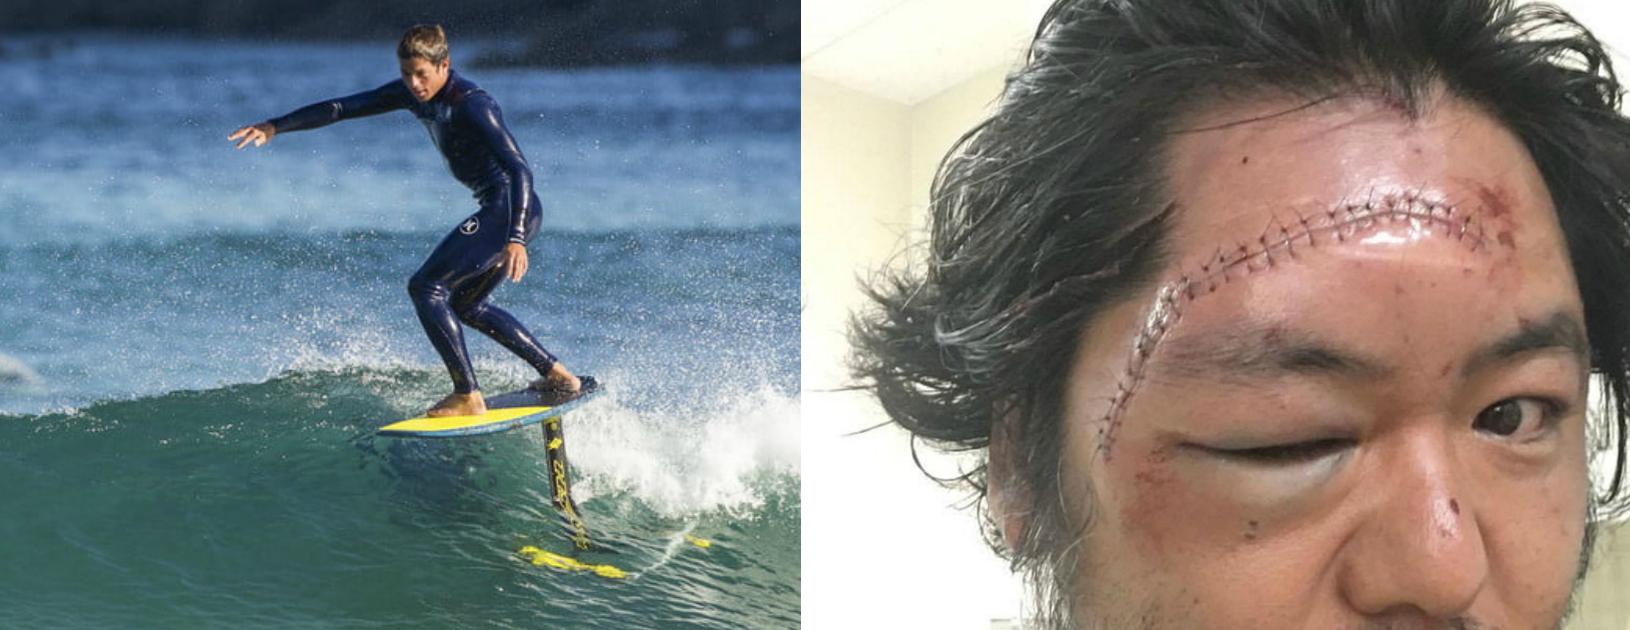 Prohiben el hydrofoil en playas de Anglet